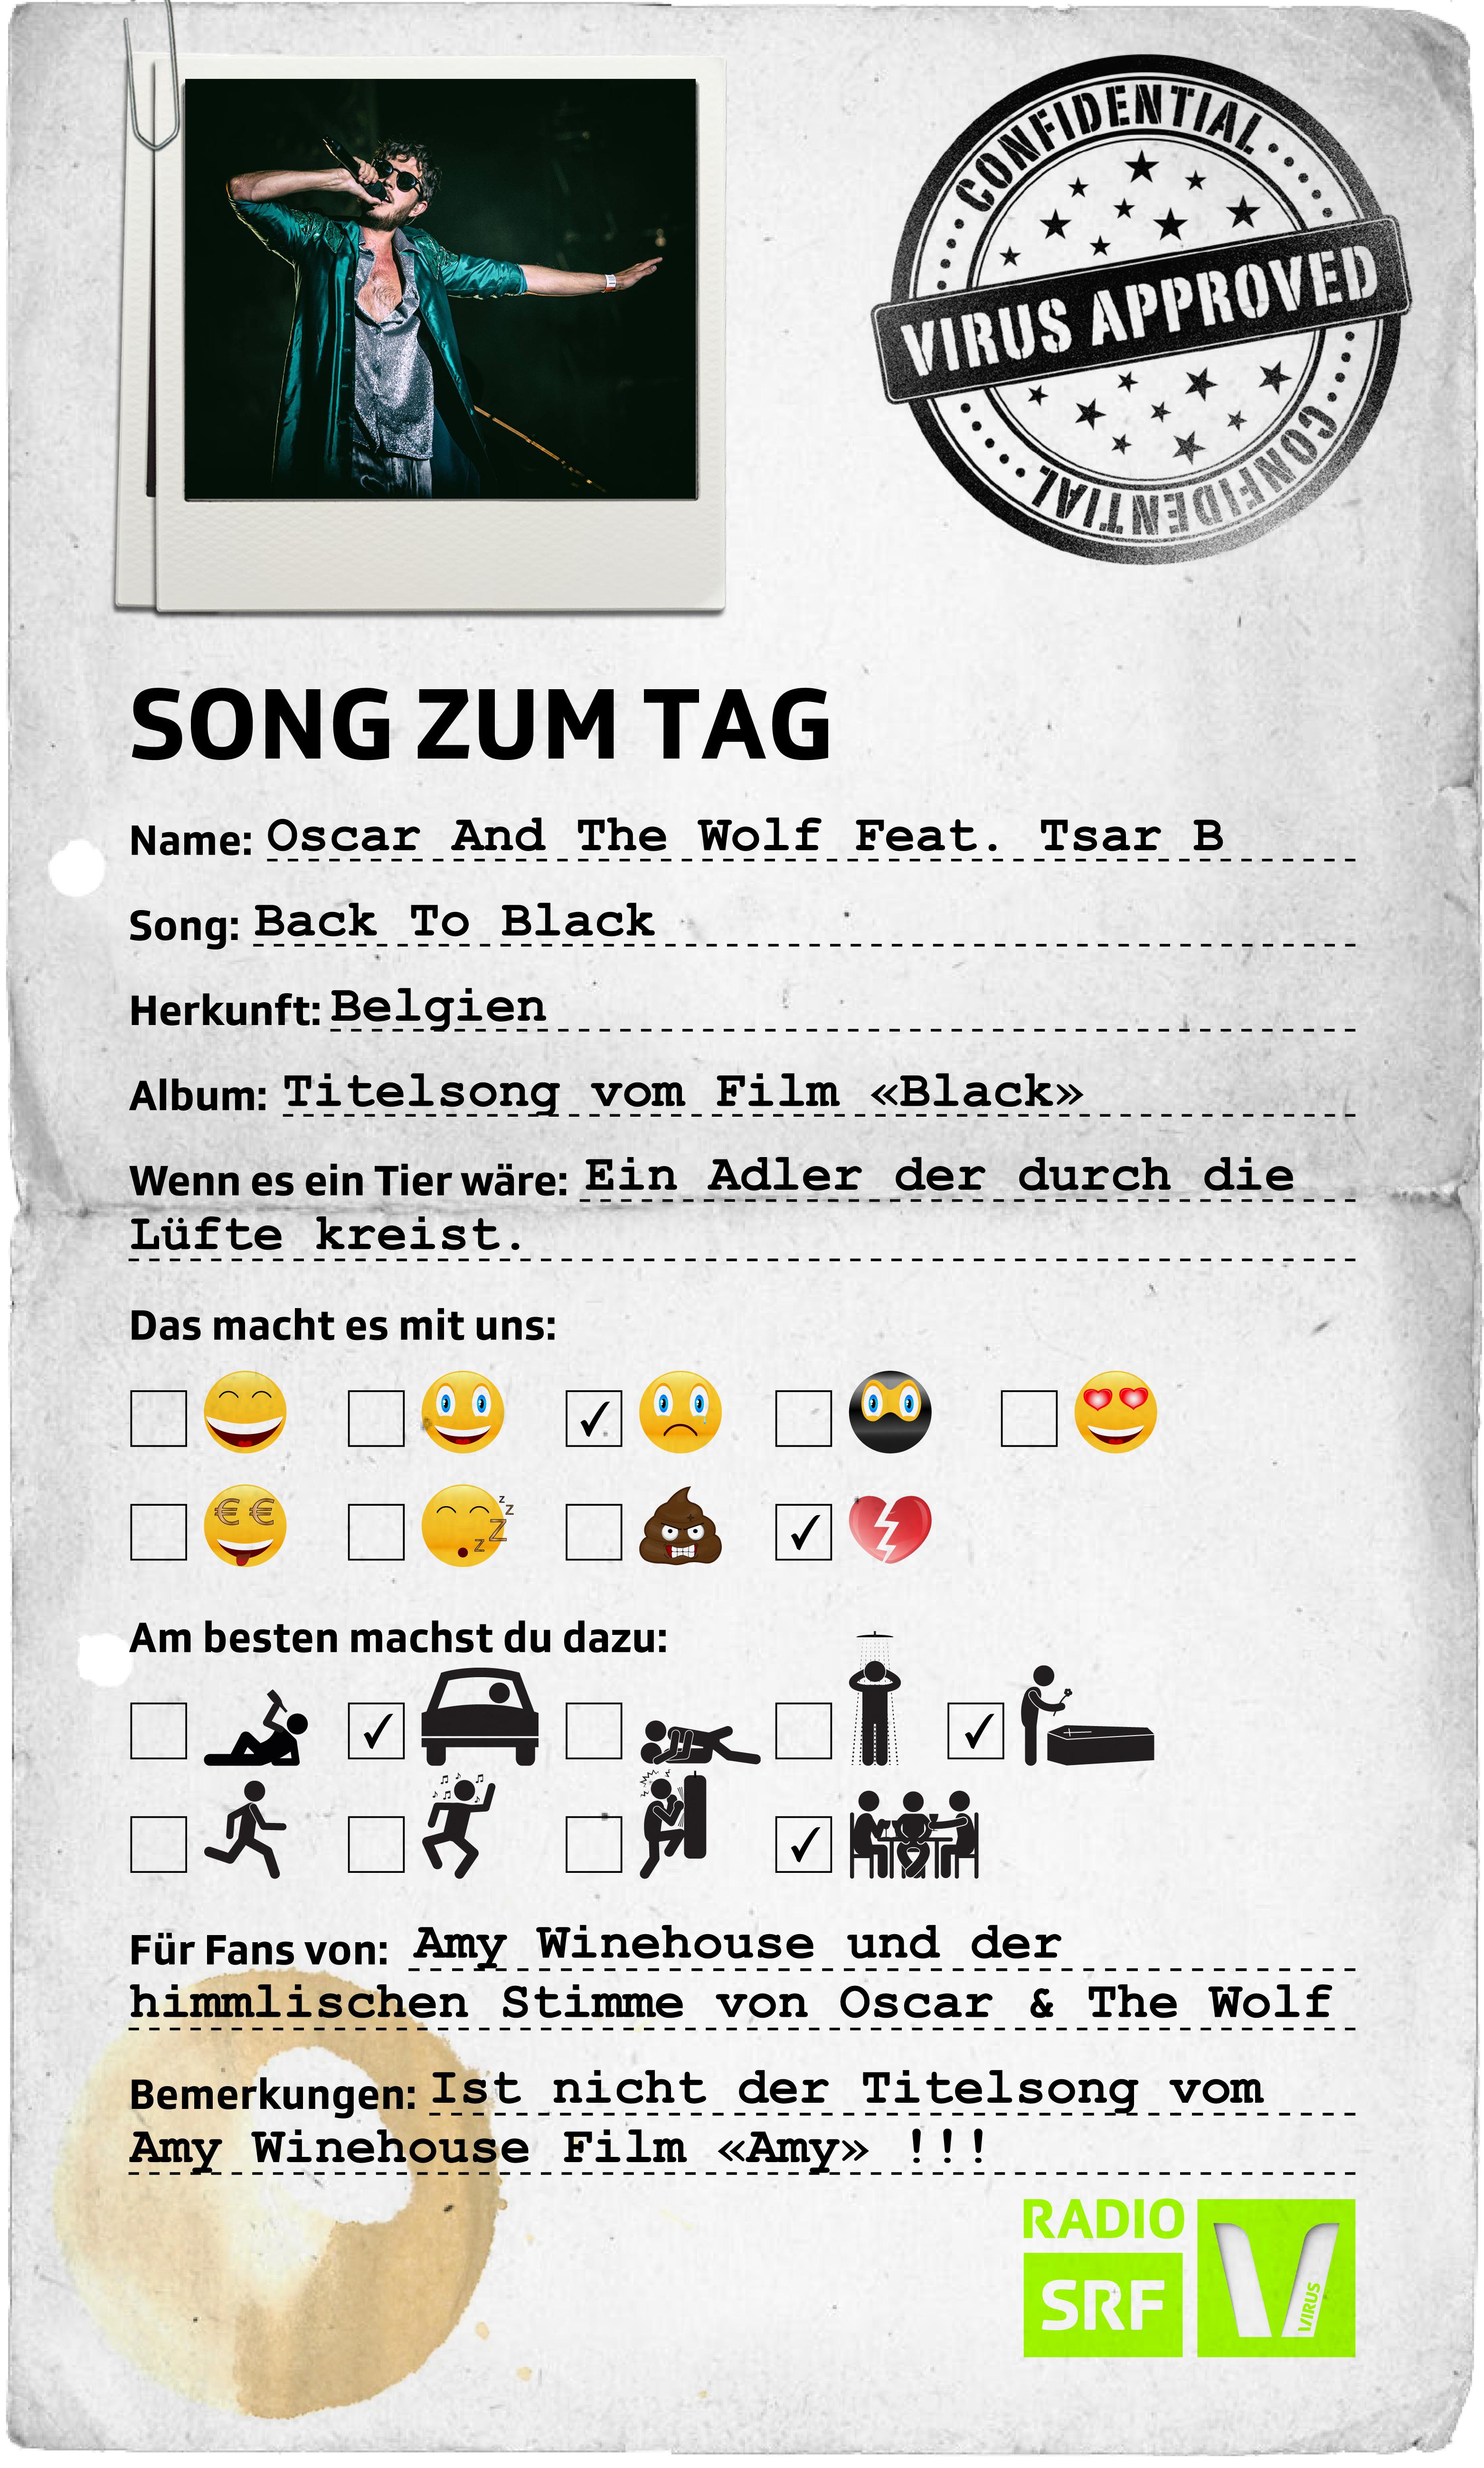 Radio SRF Virus: Song zum Tag